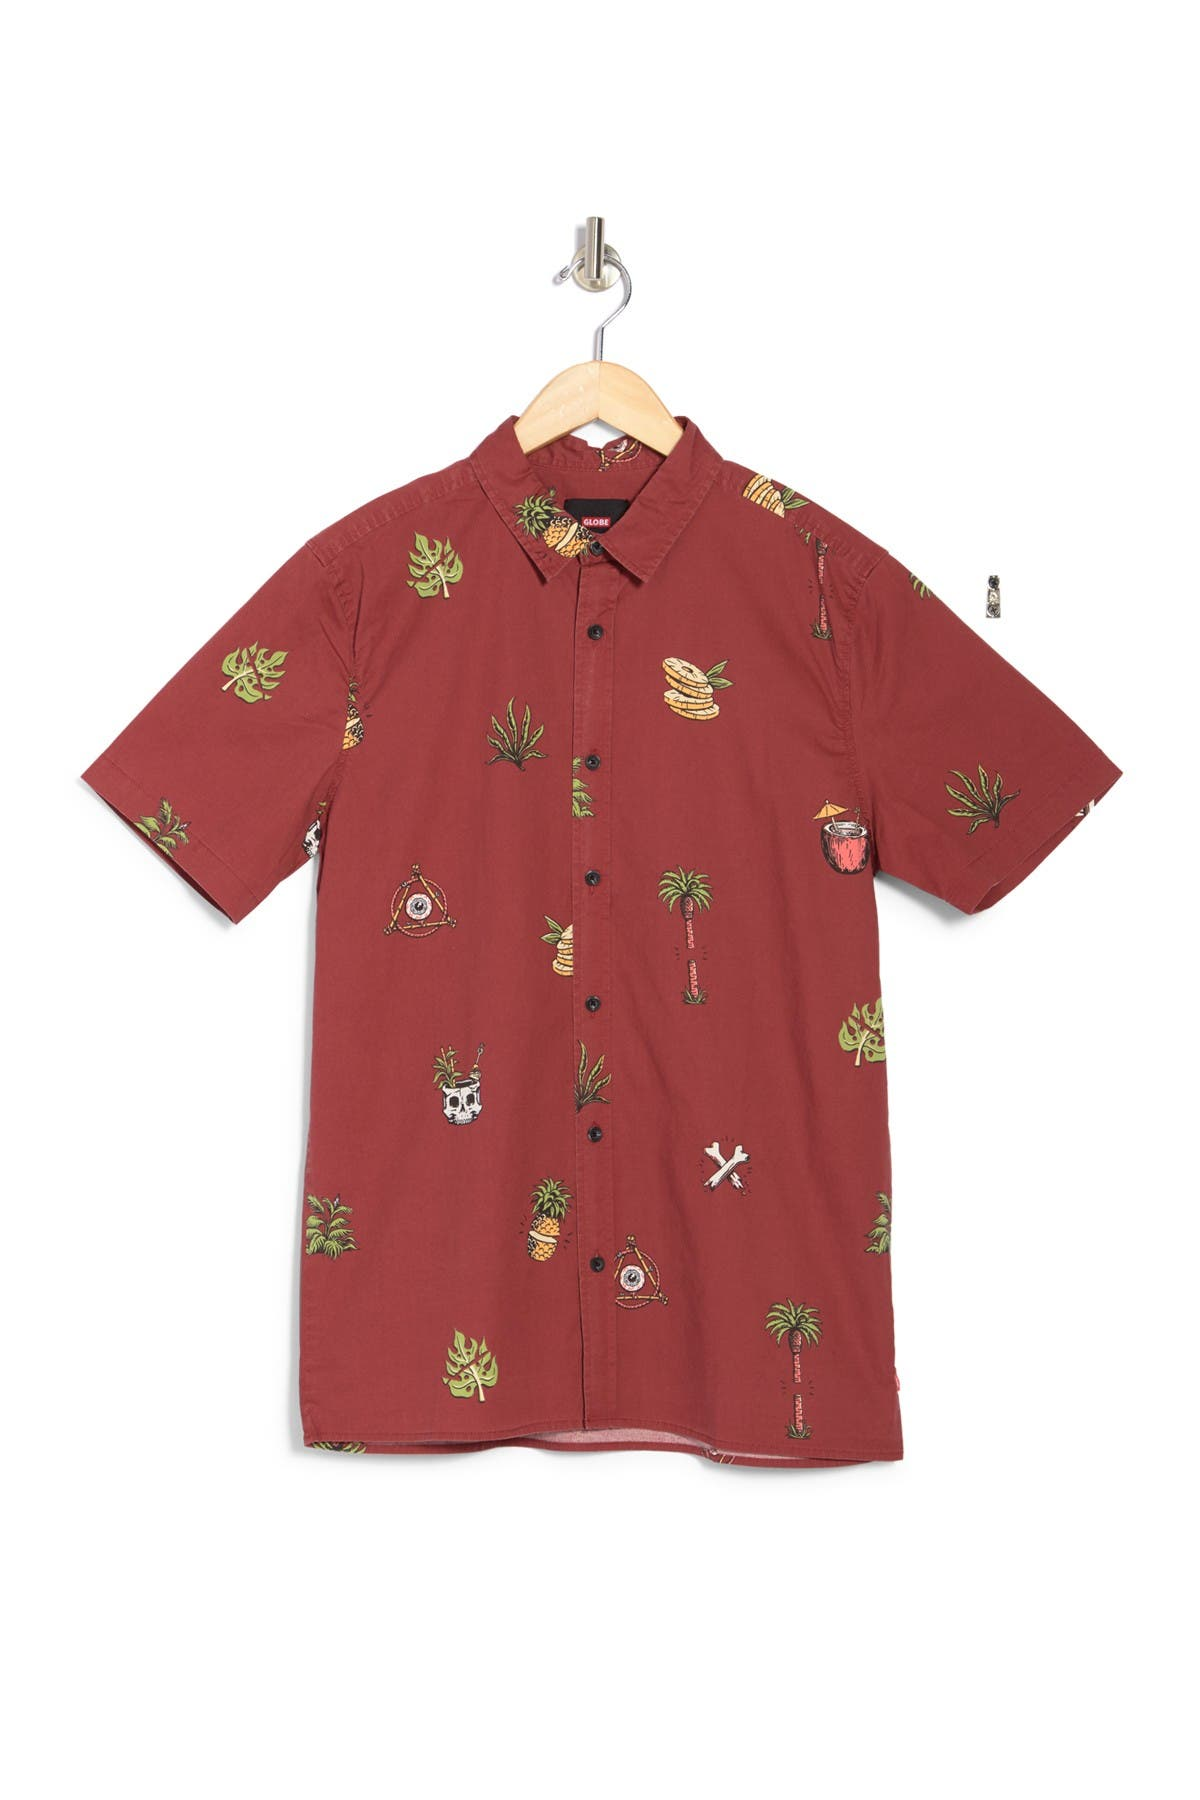 Image of GLOBE Half Cut Short Sleeve Shirt